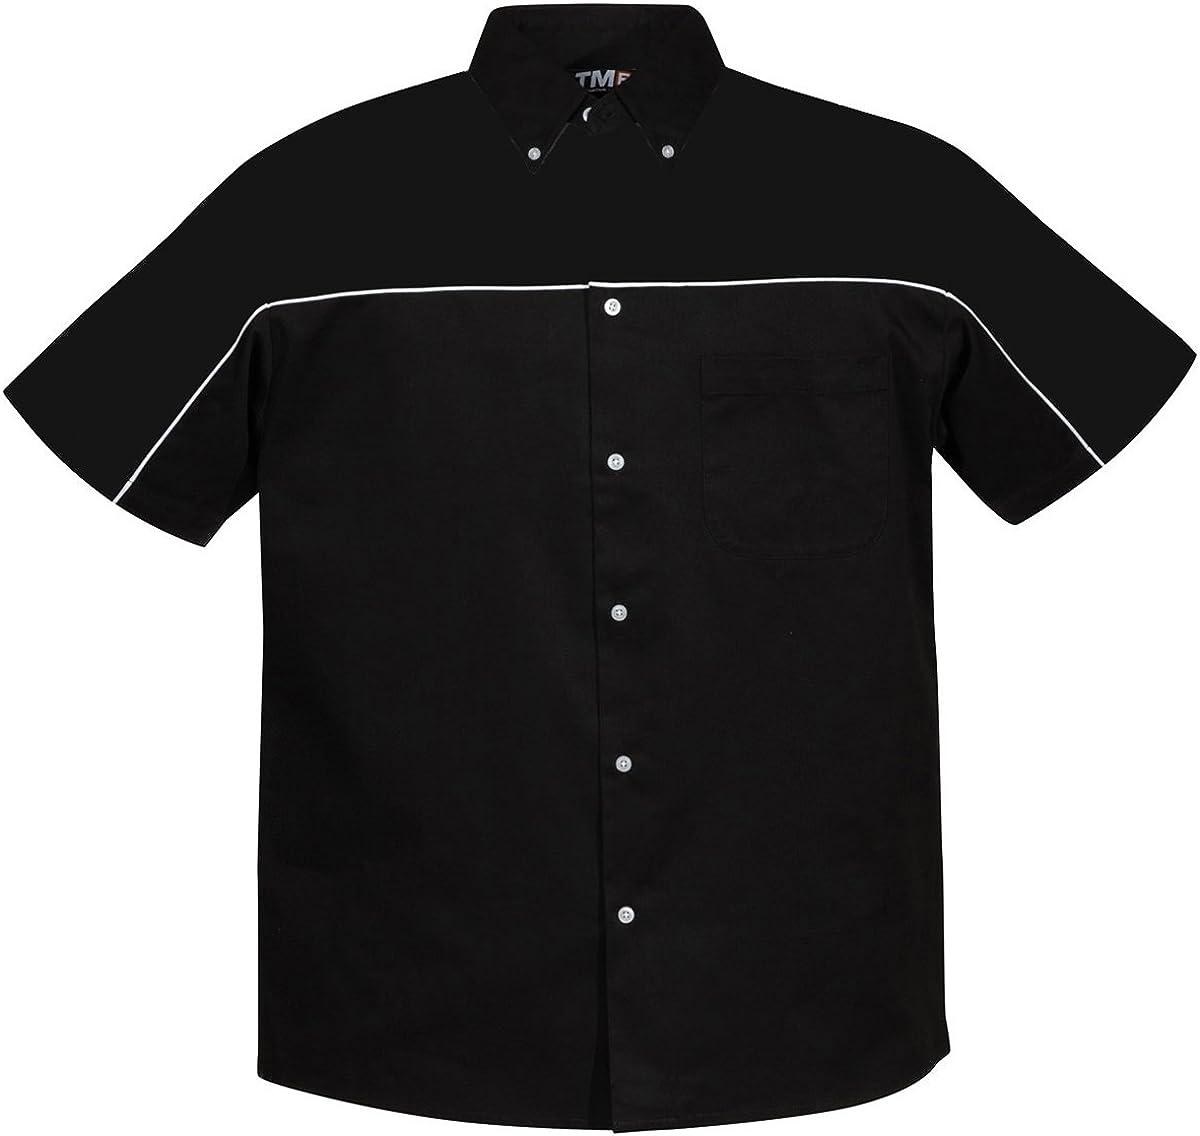 Tri-Mountain TRM Men's Poly/Cotton Downshifter Short Sleeve Twill Shirt (8 Colors, XS-6XLT)